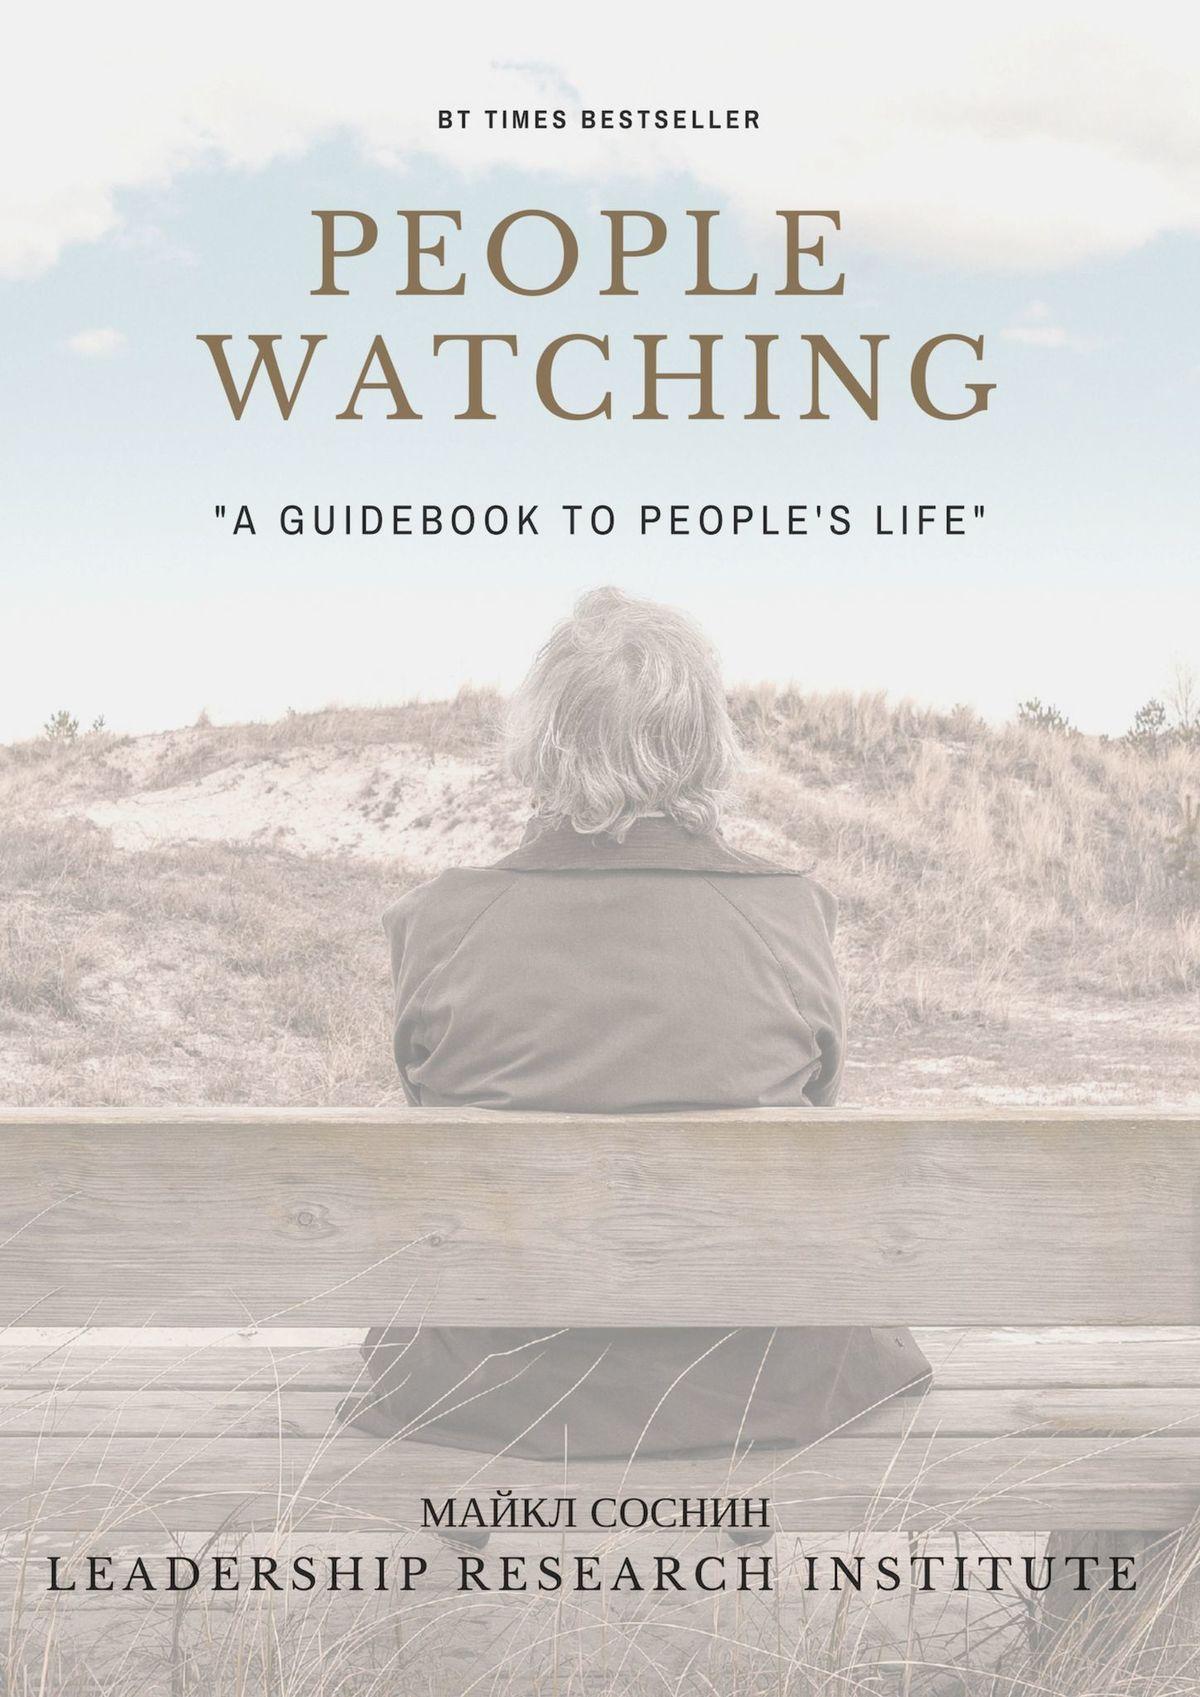 People watching